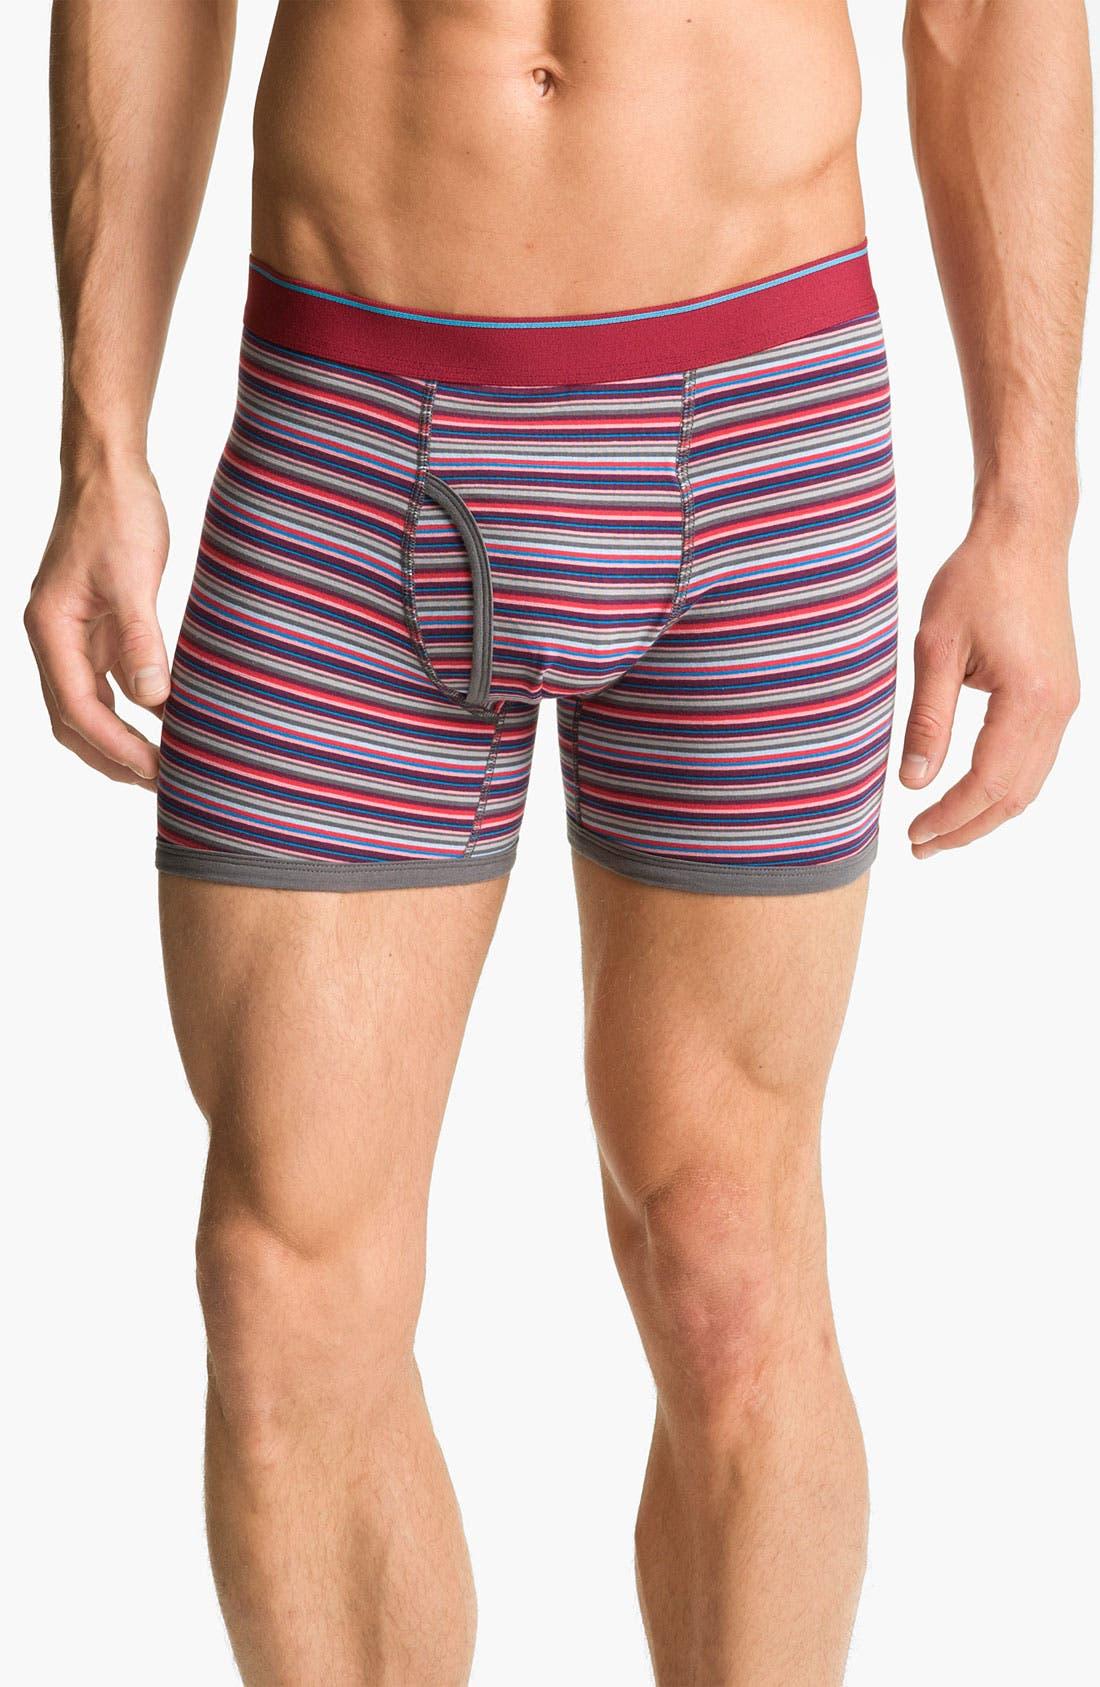 Alternate Image 1 Selected - Basic Underwear Novelty Stripe Boxer Briefs (3-Pack)